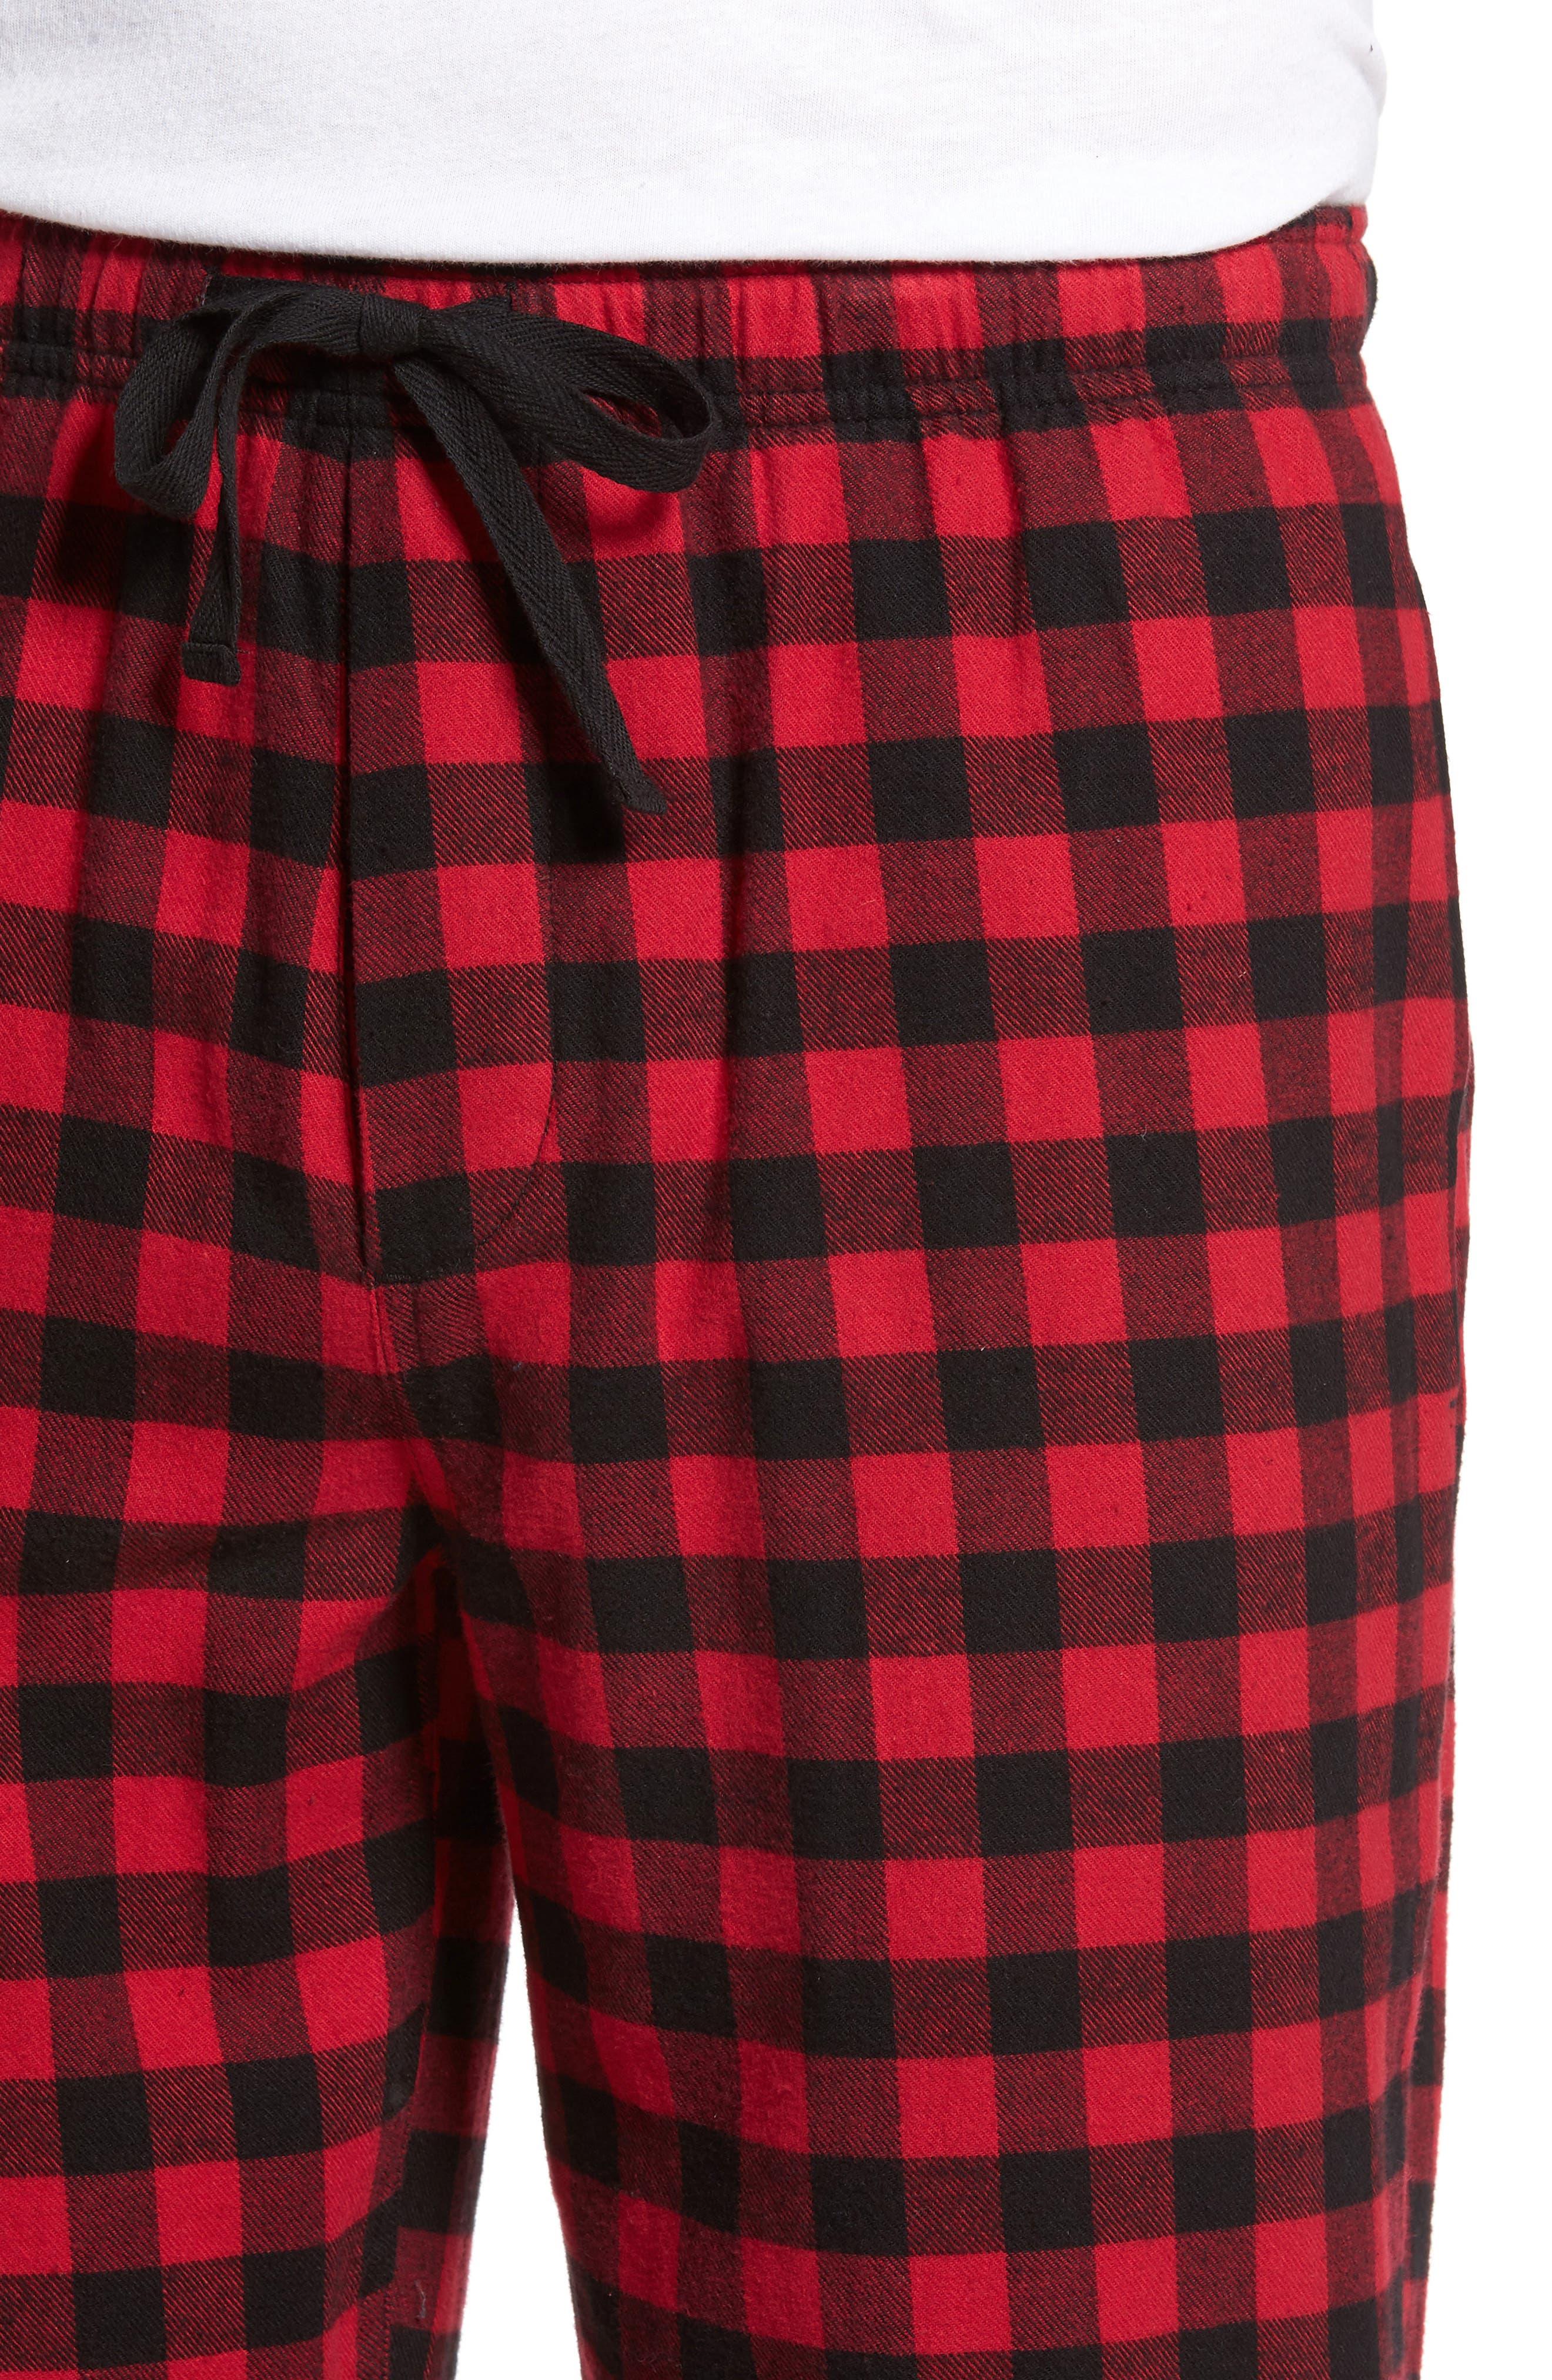 Flannel Pajama Pants,                             Alternate thumbnail 4, color,                             RED CHILI- BLACK BUFFALO